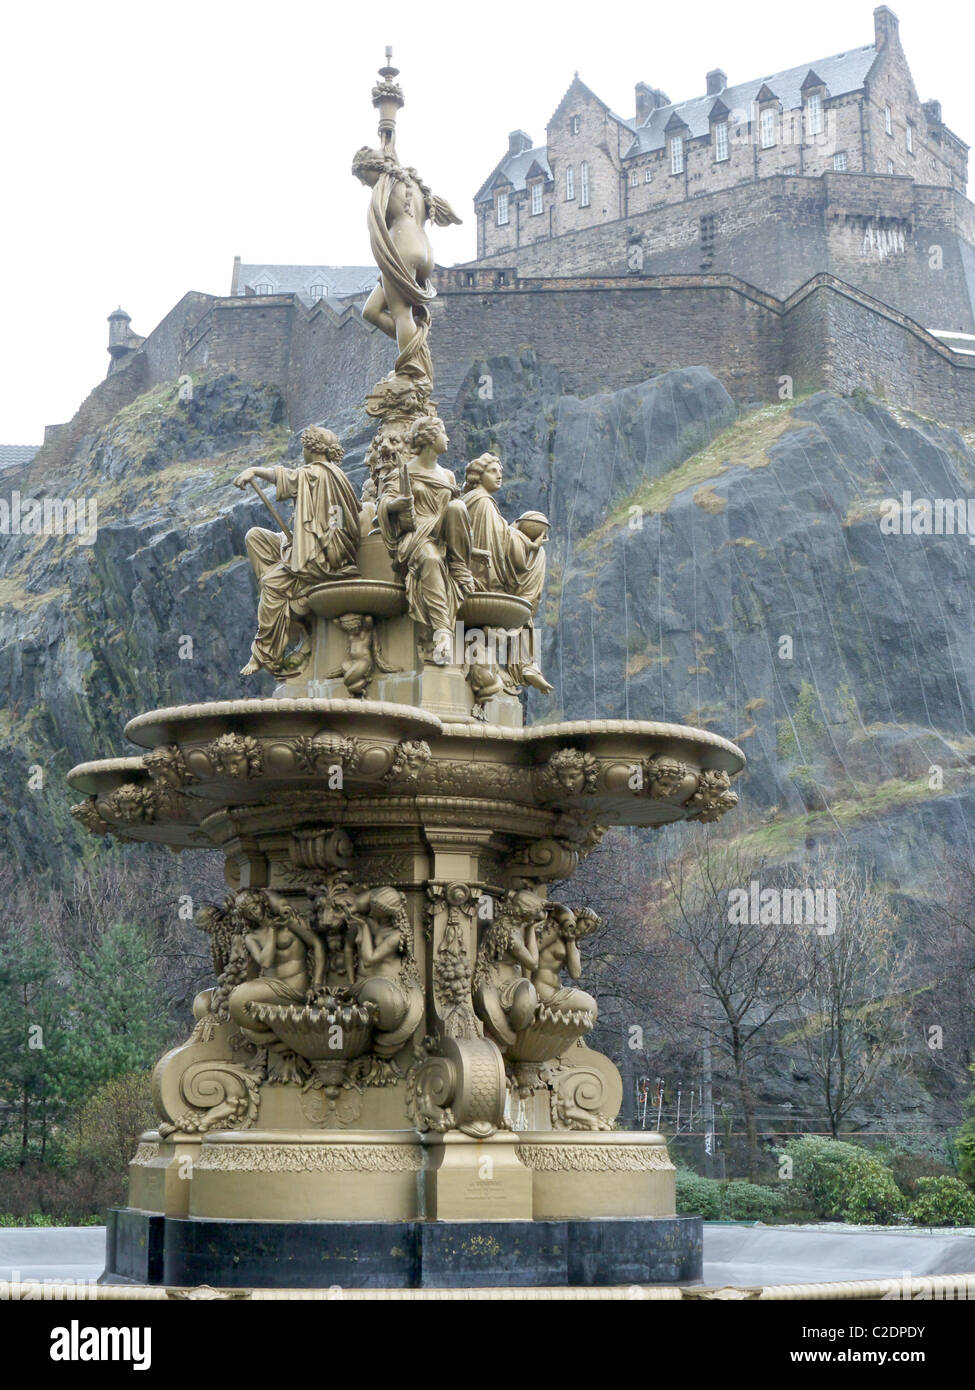 The Ross Fountain, Princes Street Gardens, Edinburgh, Scotland, UK.  St. John's and St. Cuthbert's churches - Stock Image